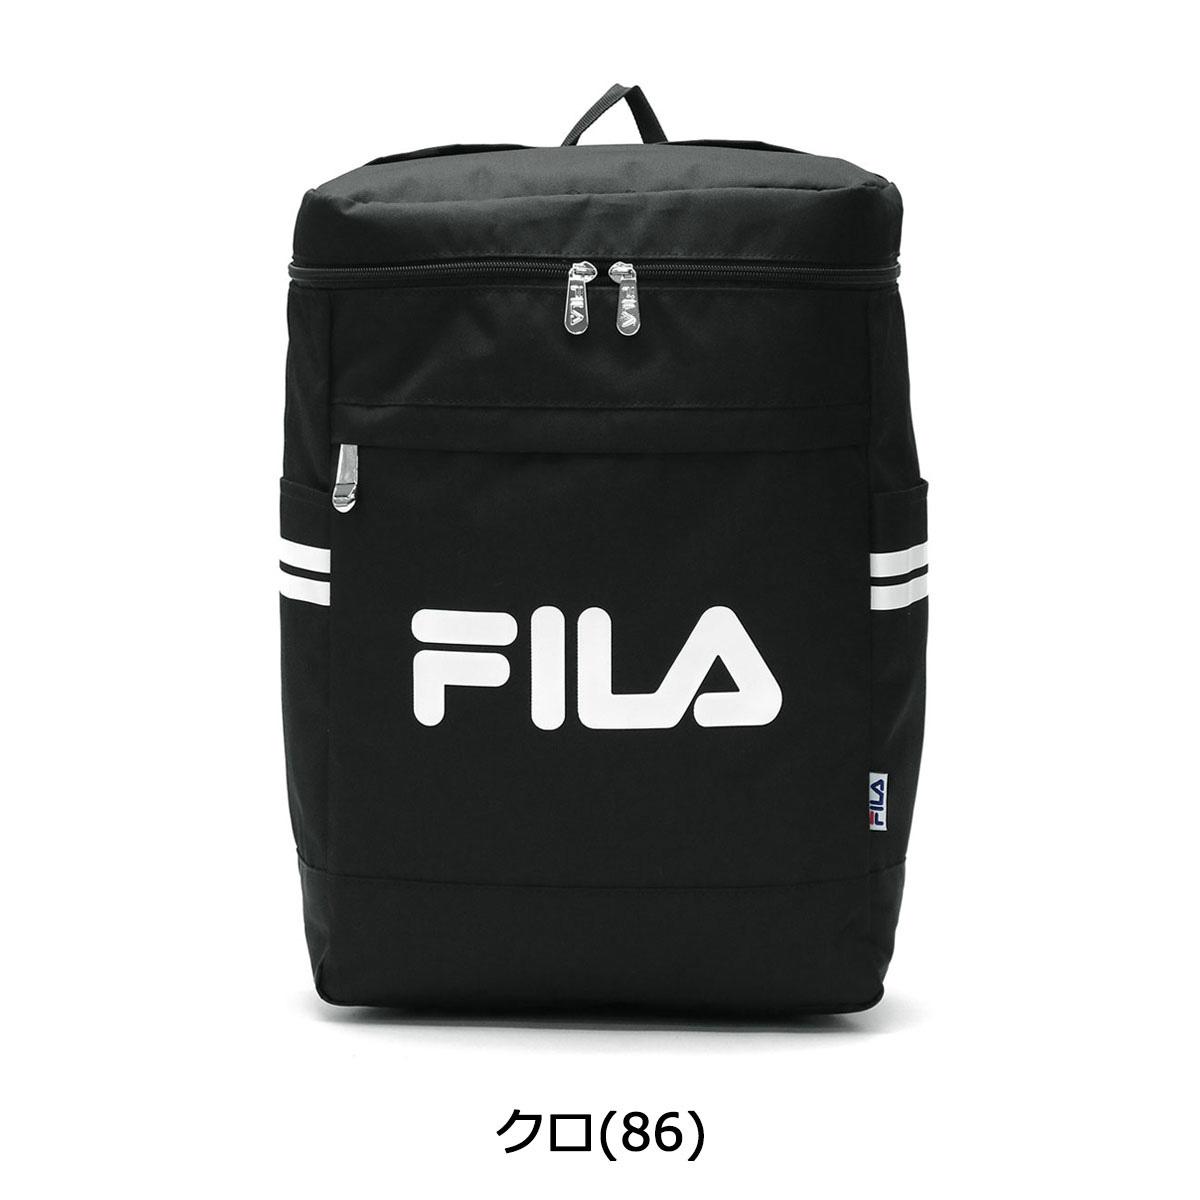 GALLERIA Bag-Luggage  FILA Backpack commuter school bag B4 men s ladies  7495   Rakuten Global Market 0038ca23cf